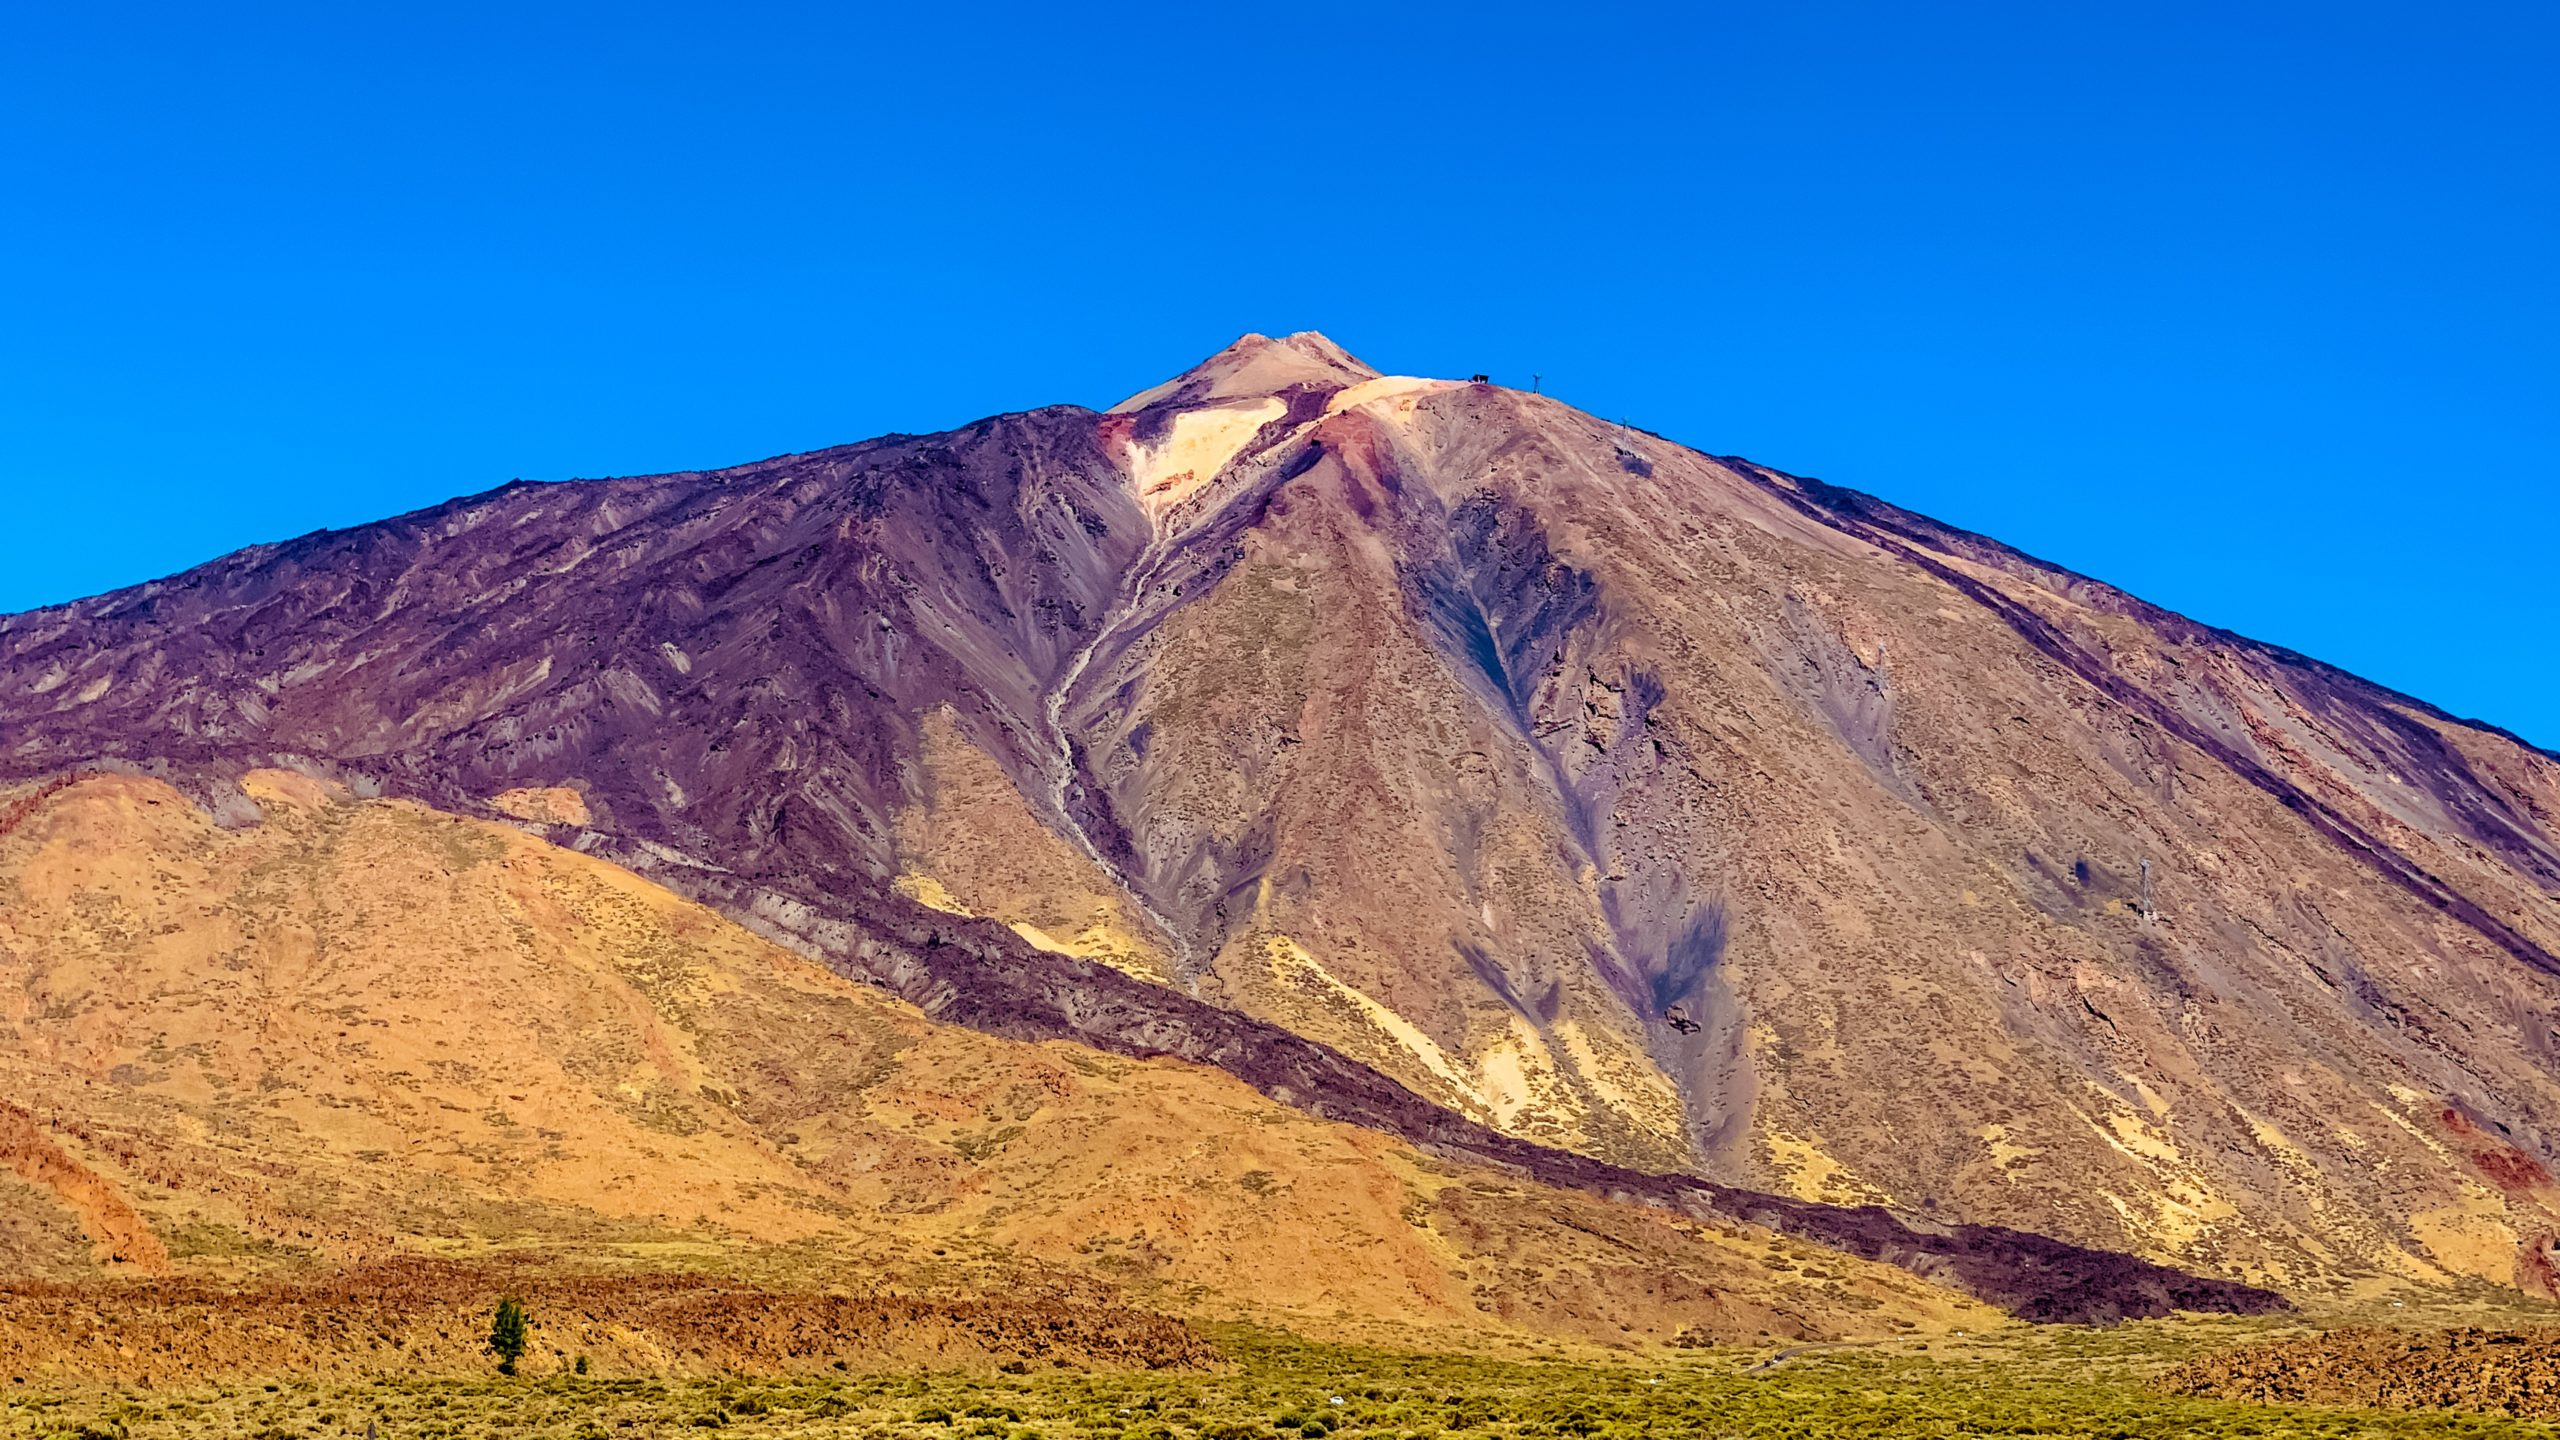 Atlantik, Teneriffa, am Fuß des Pico del Teide